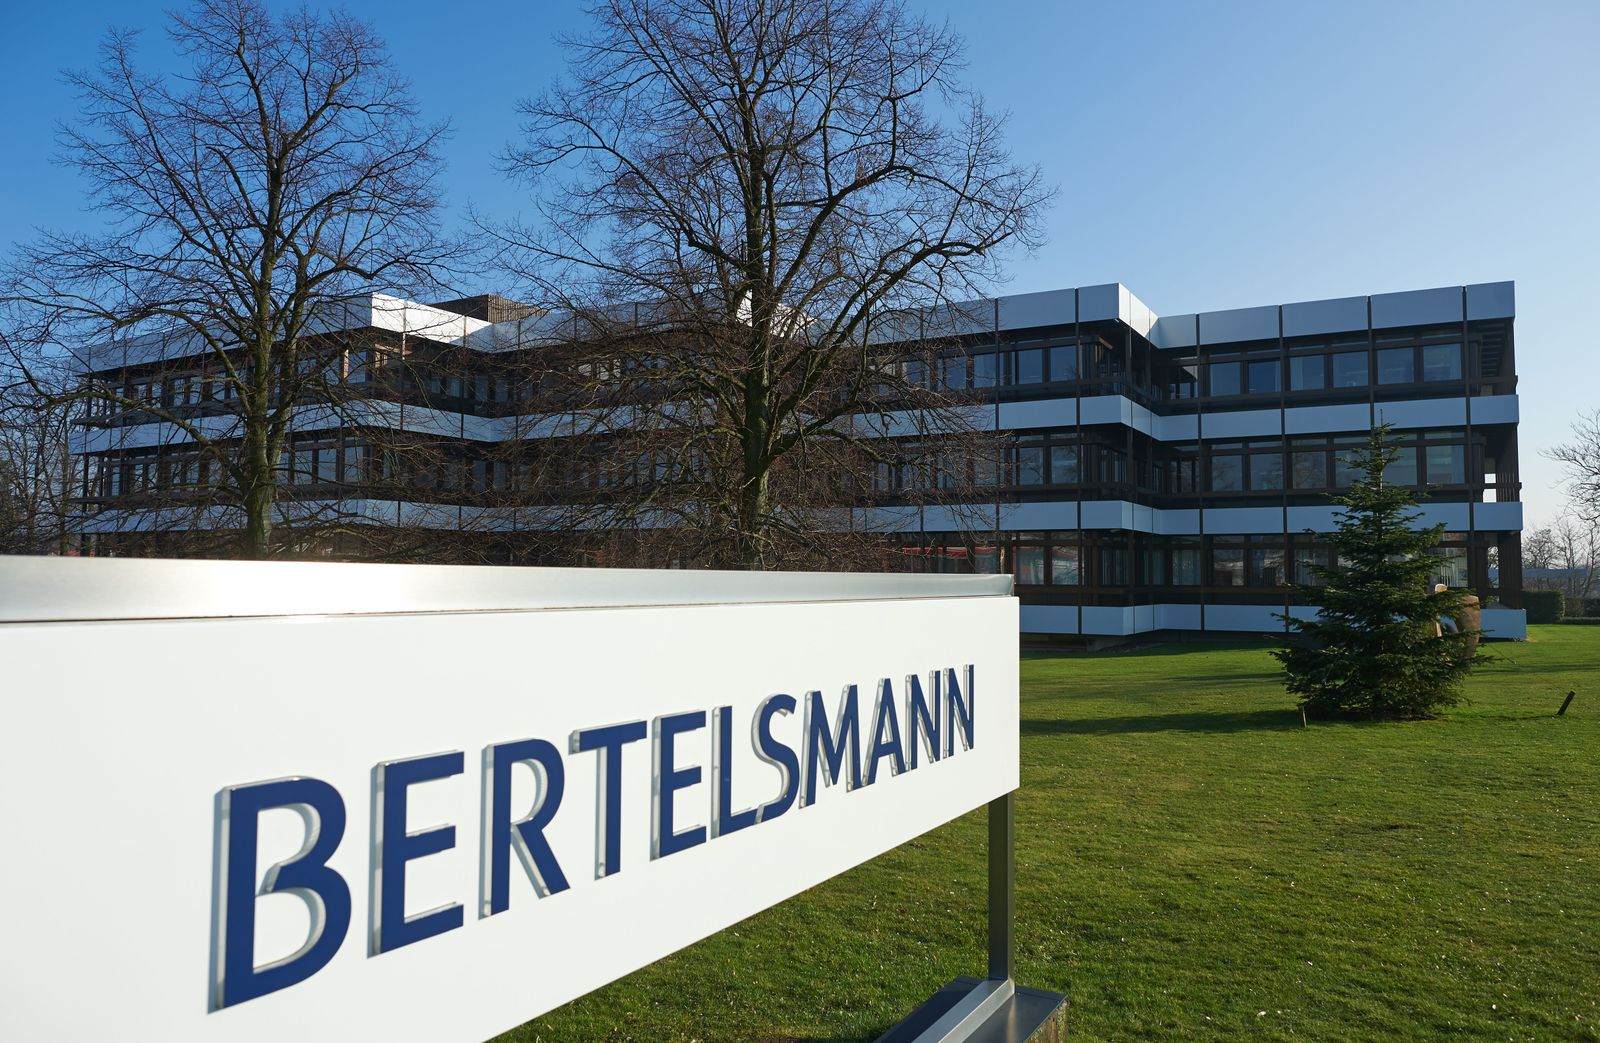 Bertelsmann/ Copyright